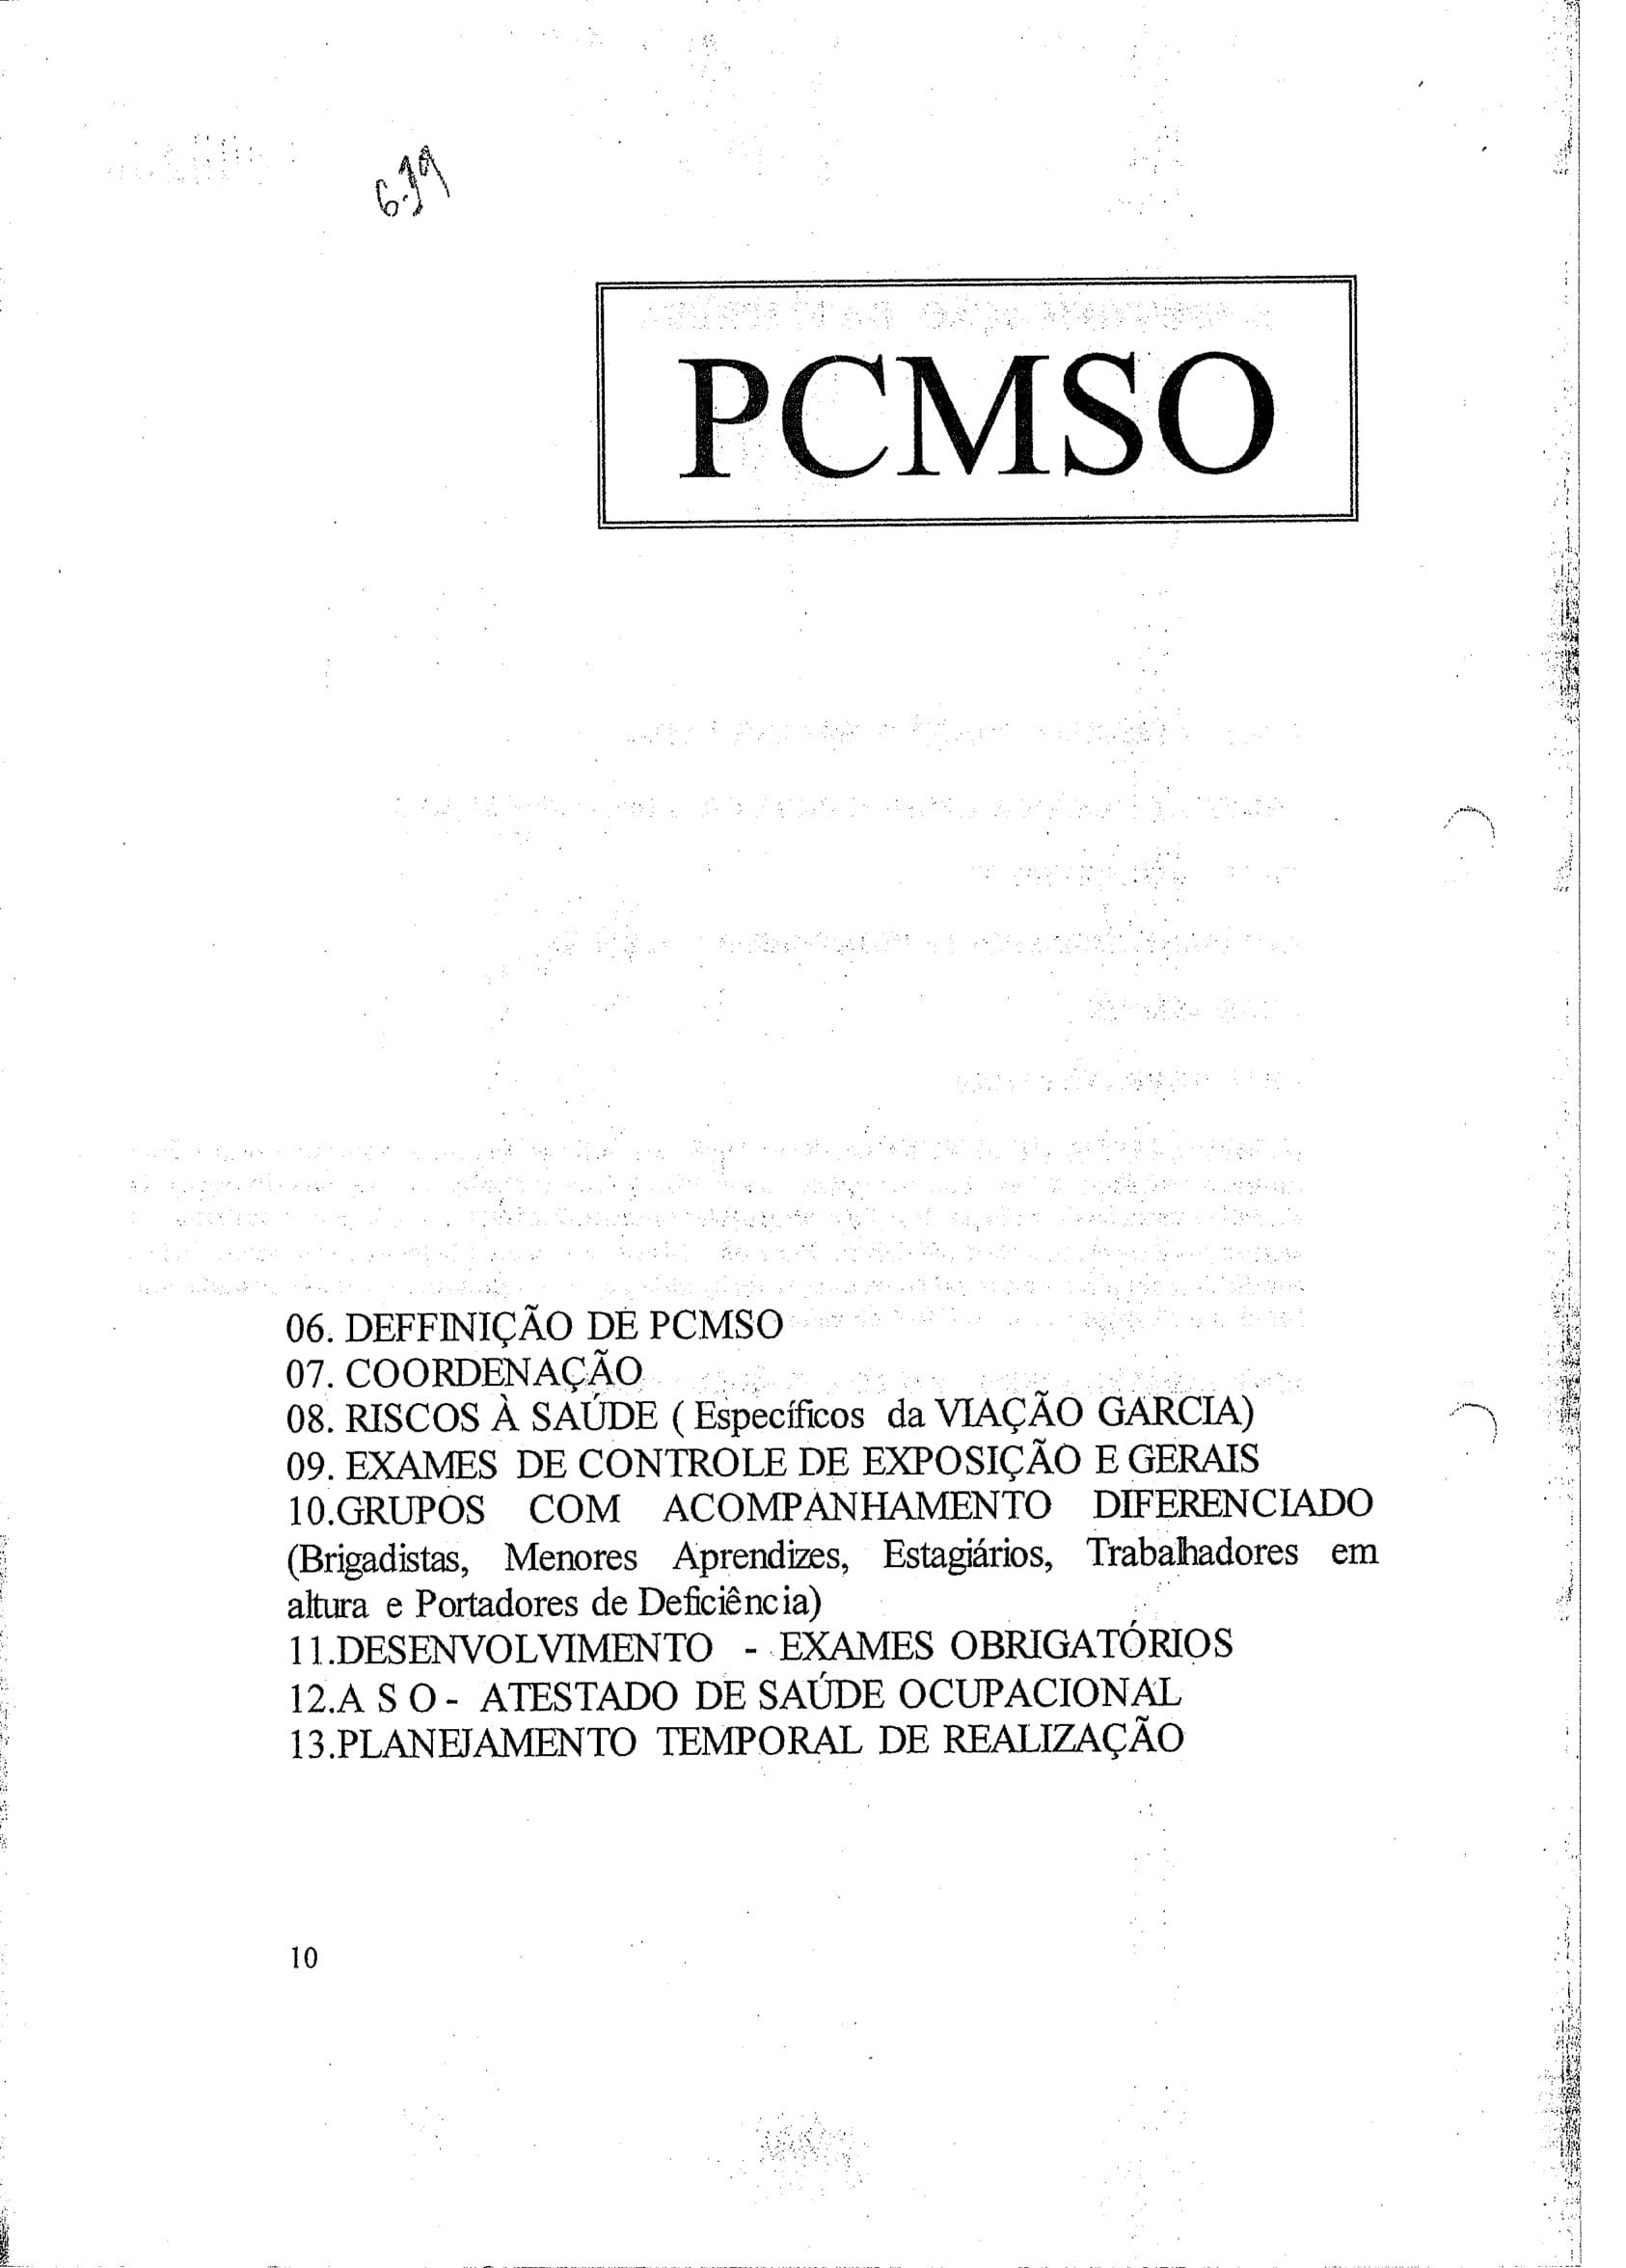 PL001222019-088